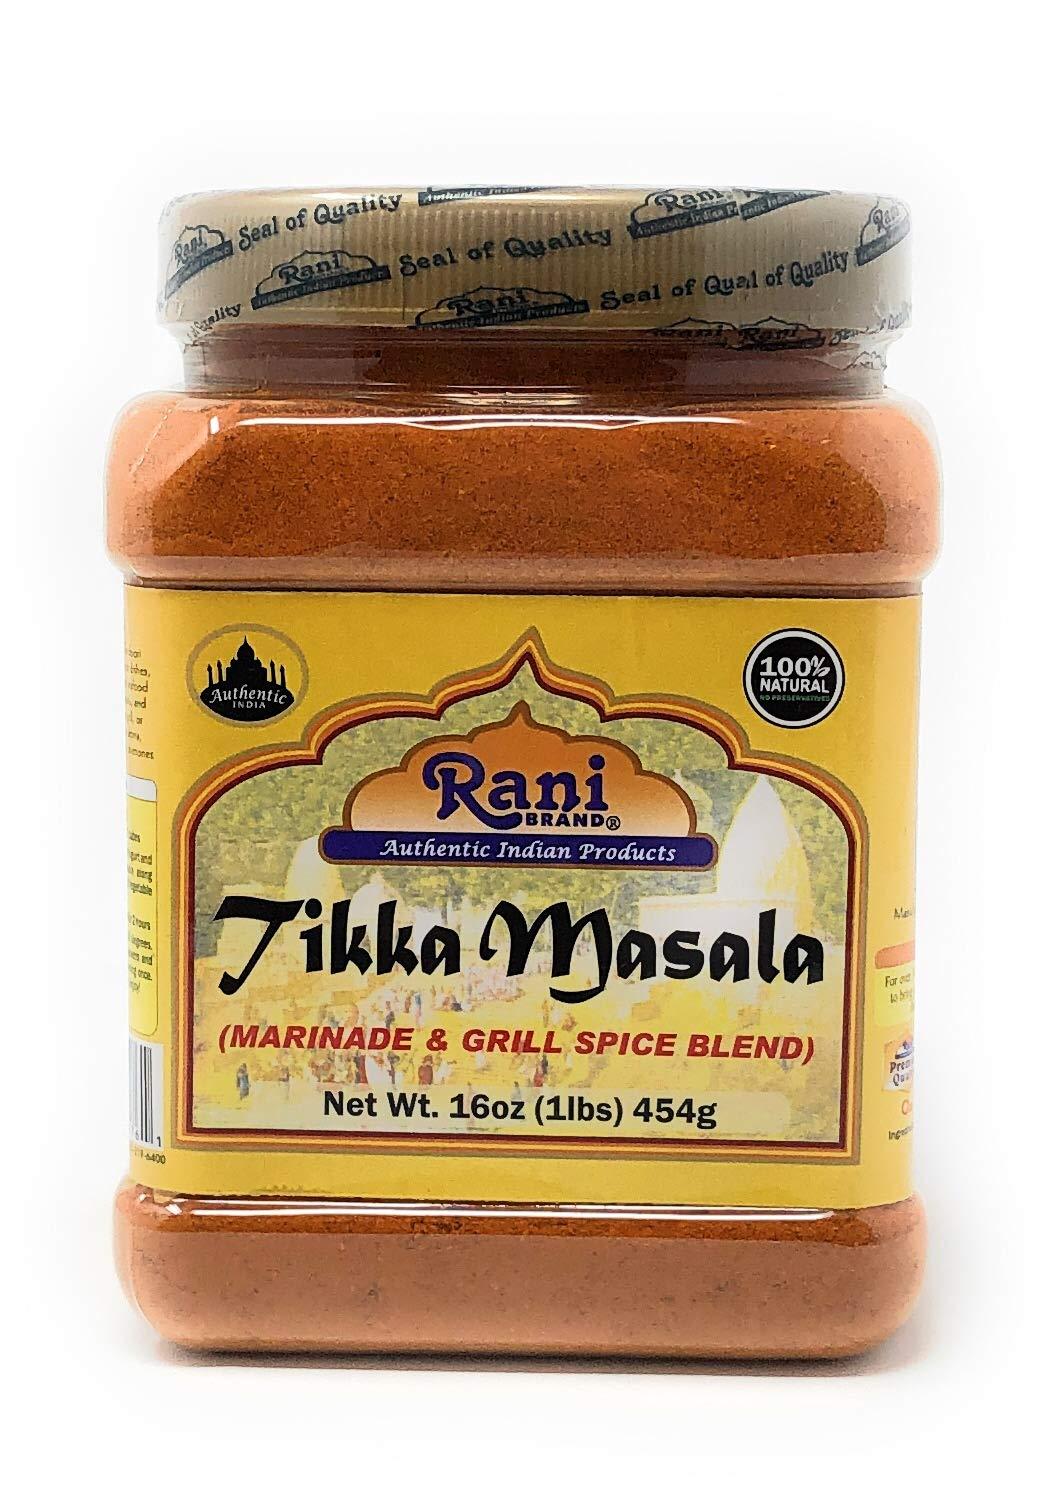 Rani Tikka Masala Indian Spice Blend 16oz (454g) ~ All Natural, Salt-Free | Vegan | No Colors | Gluten Free Ingredients | NON-GMO ...